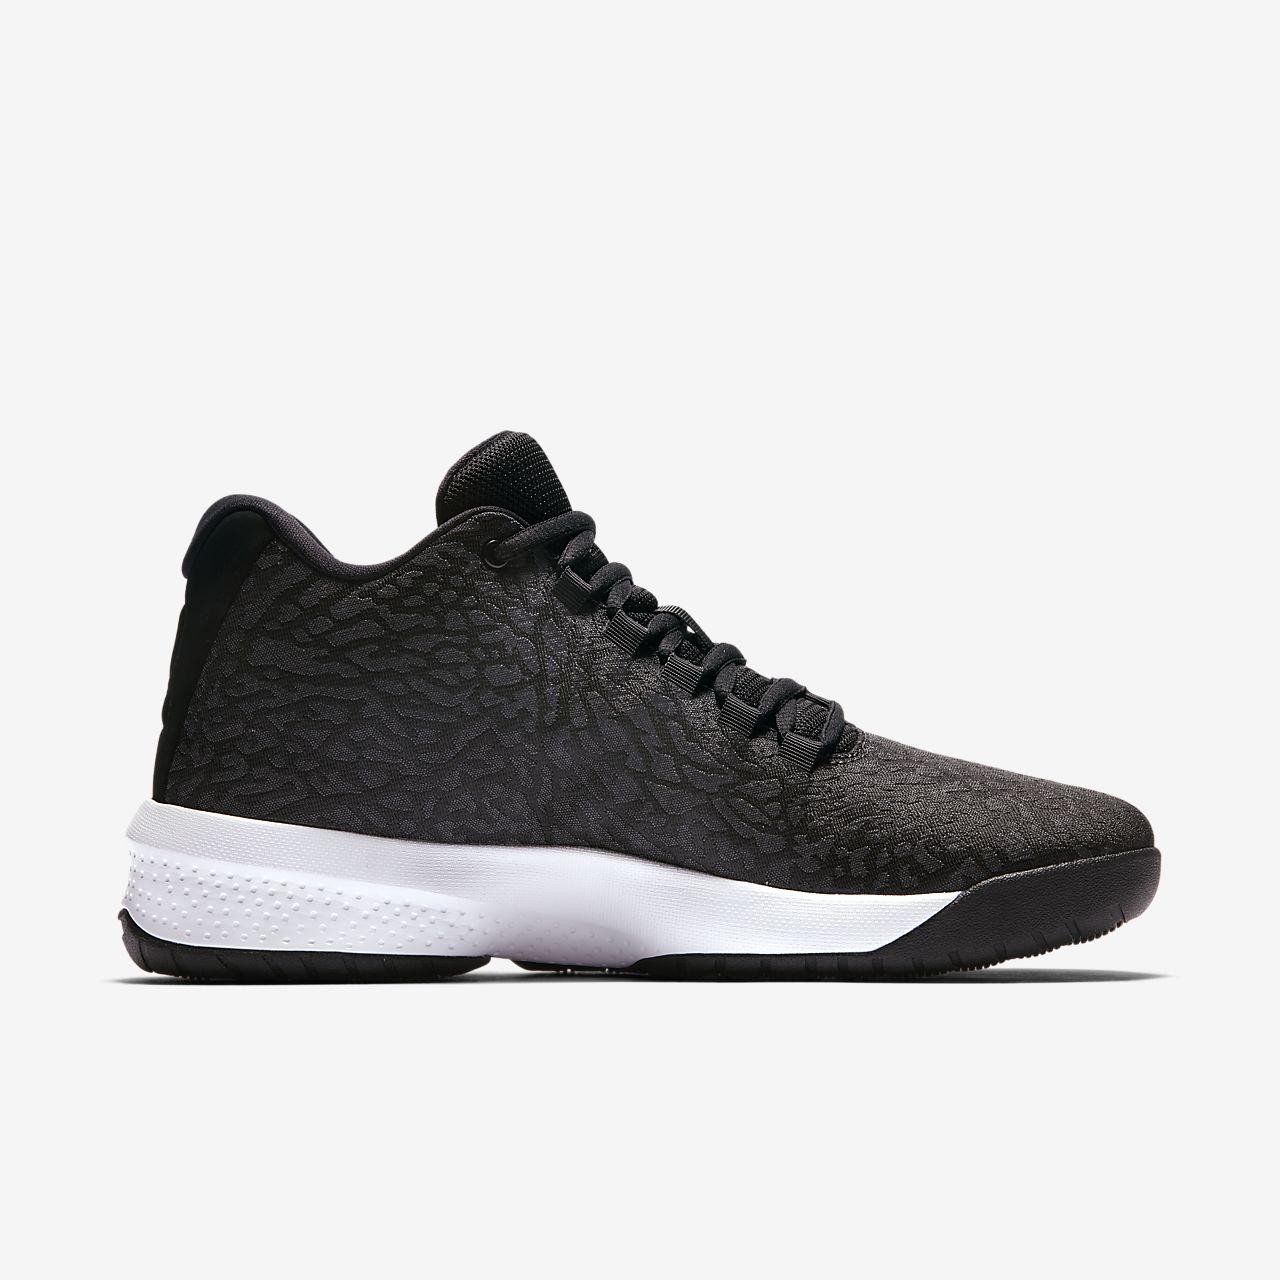 NIKE Jordan Trainer Pro Scarpe da Uomo Exclusive Sneaker Sneakers Scarpe Sportive